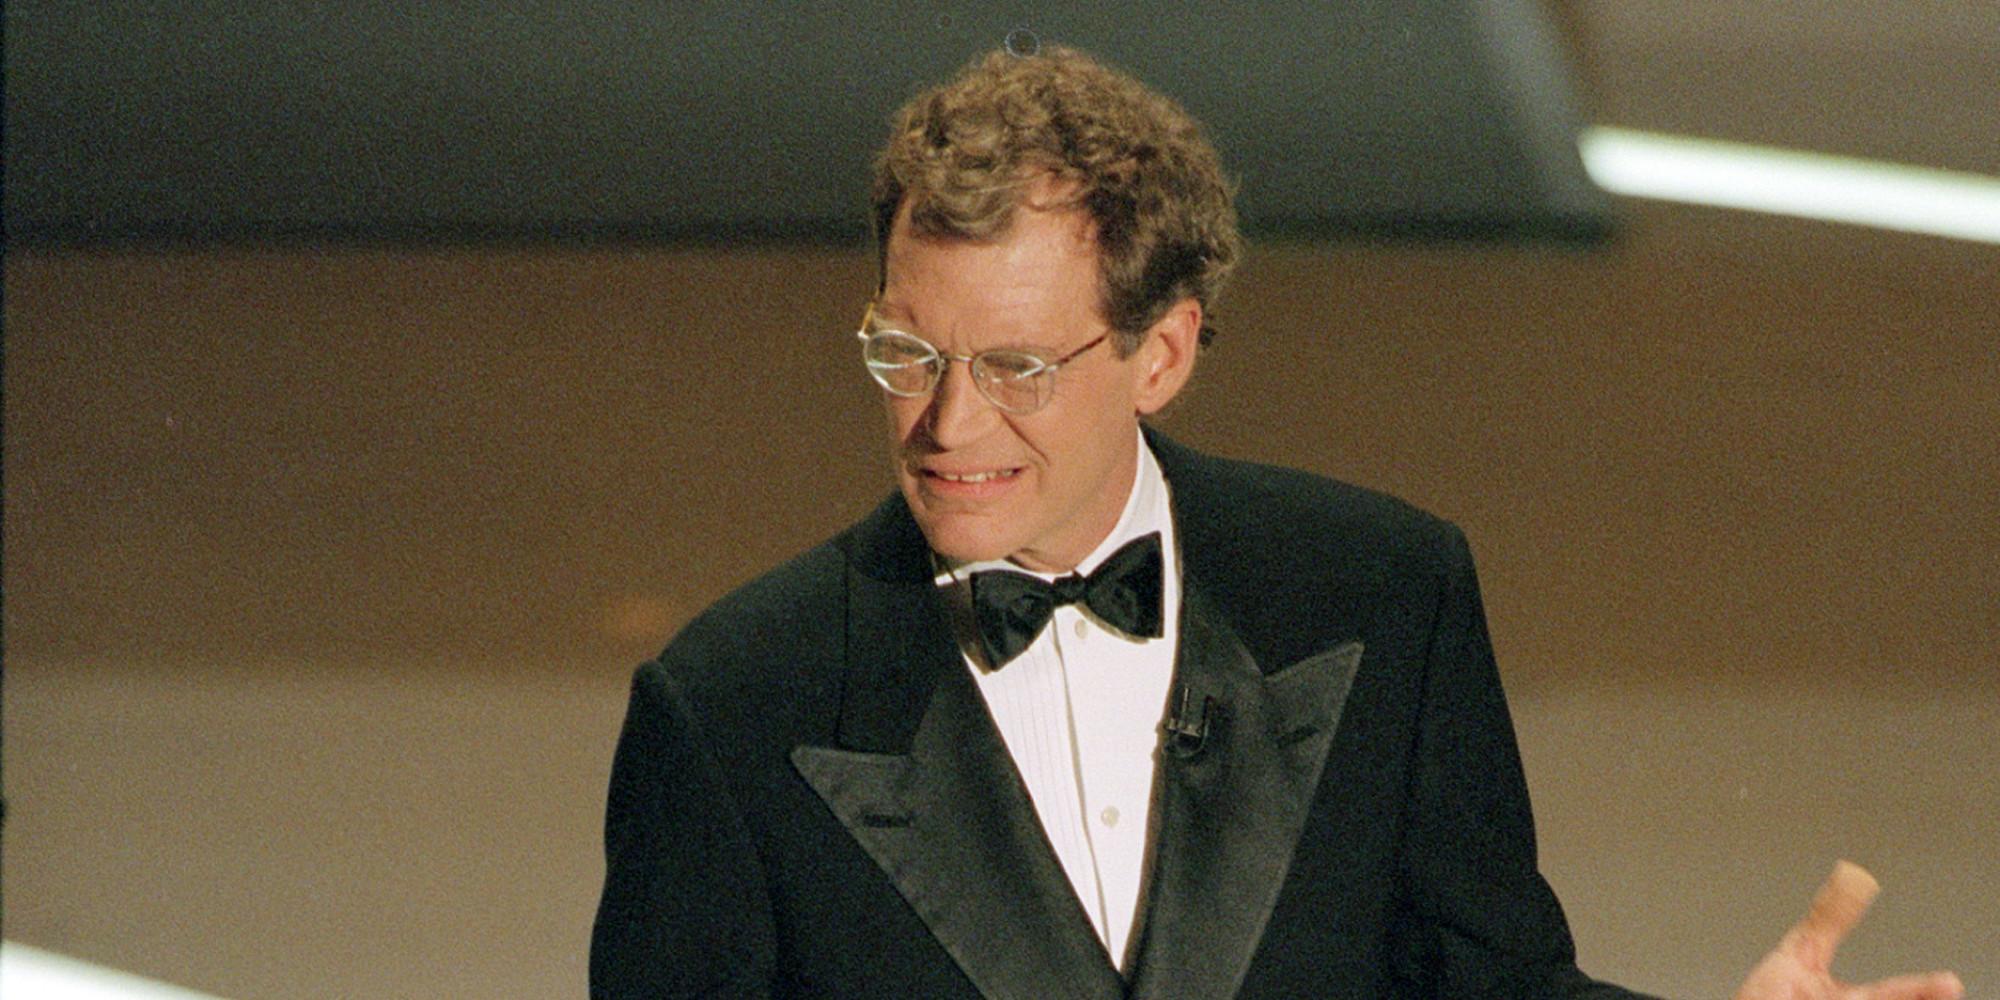 Its Been 20 Years Since David Lettermans Infamous Oprah Uma Joke